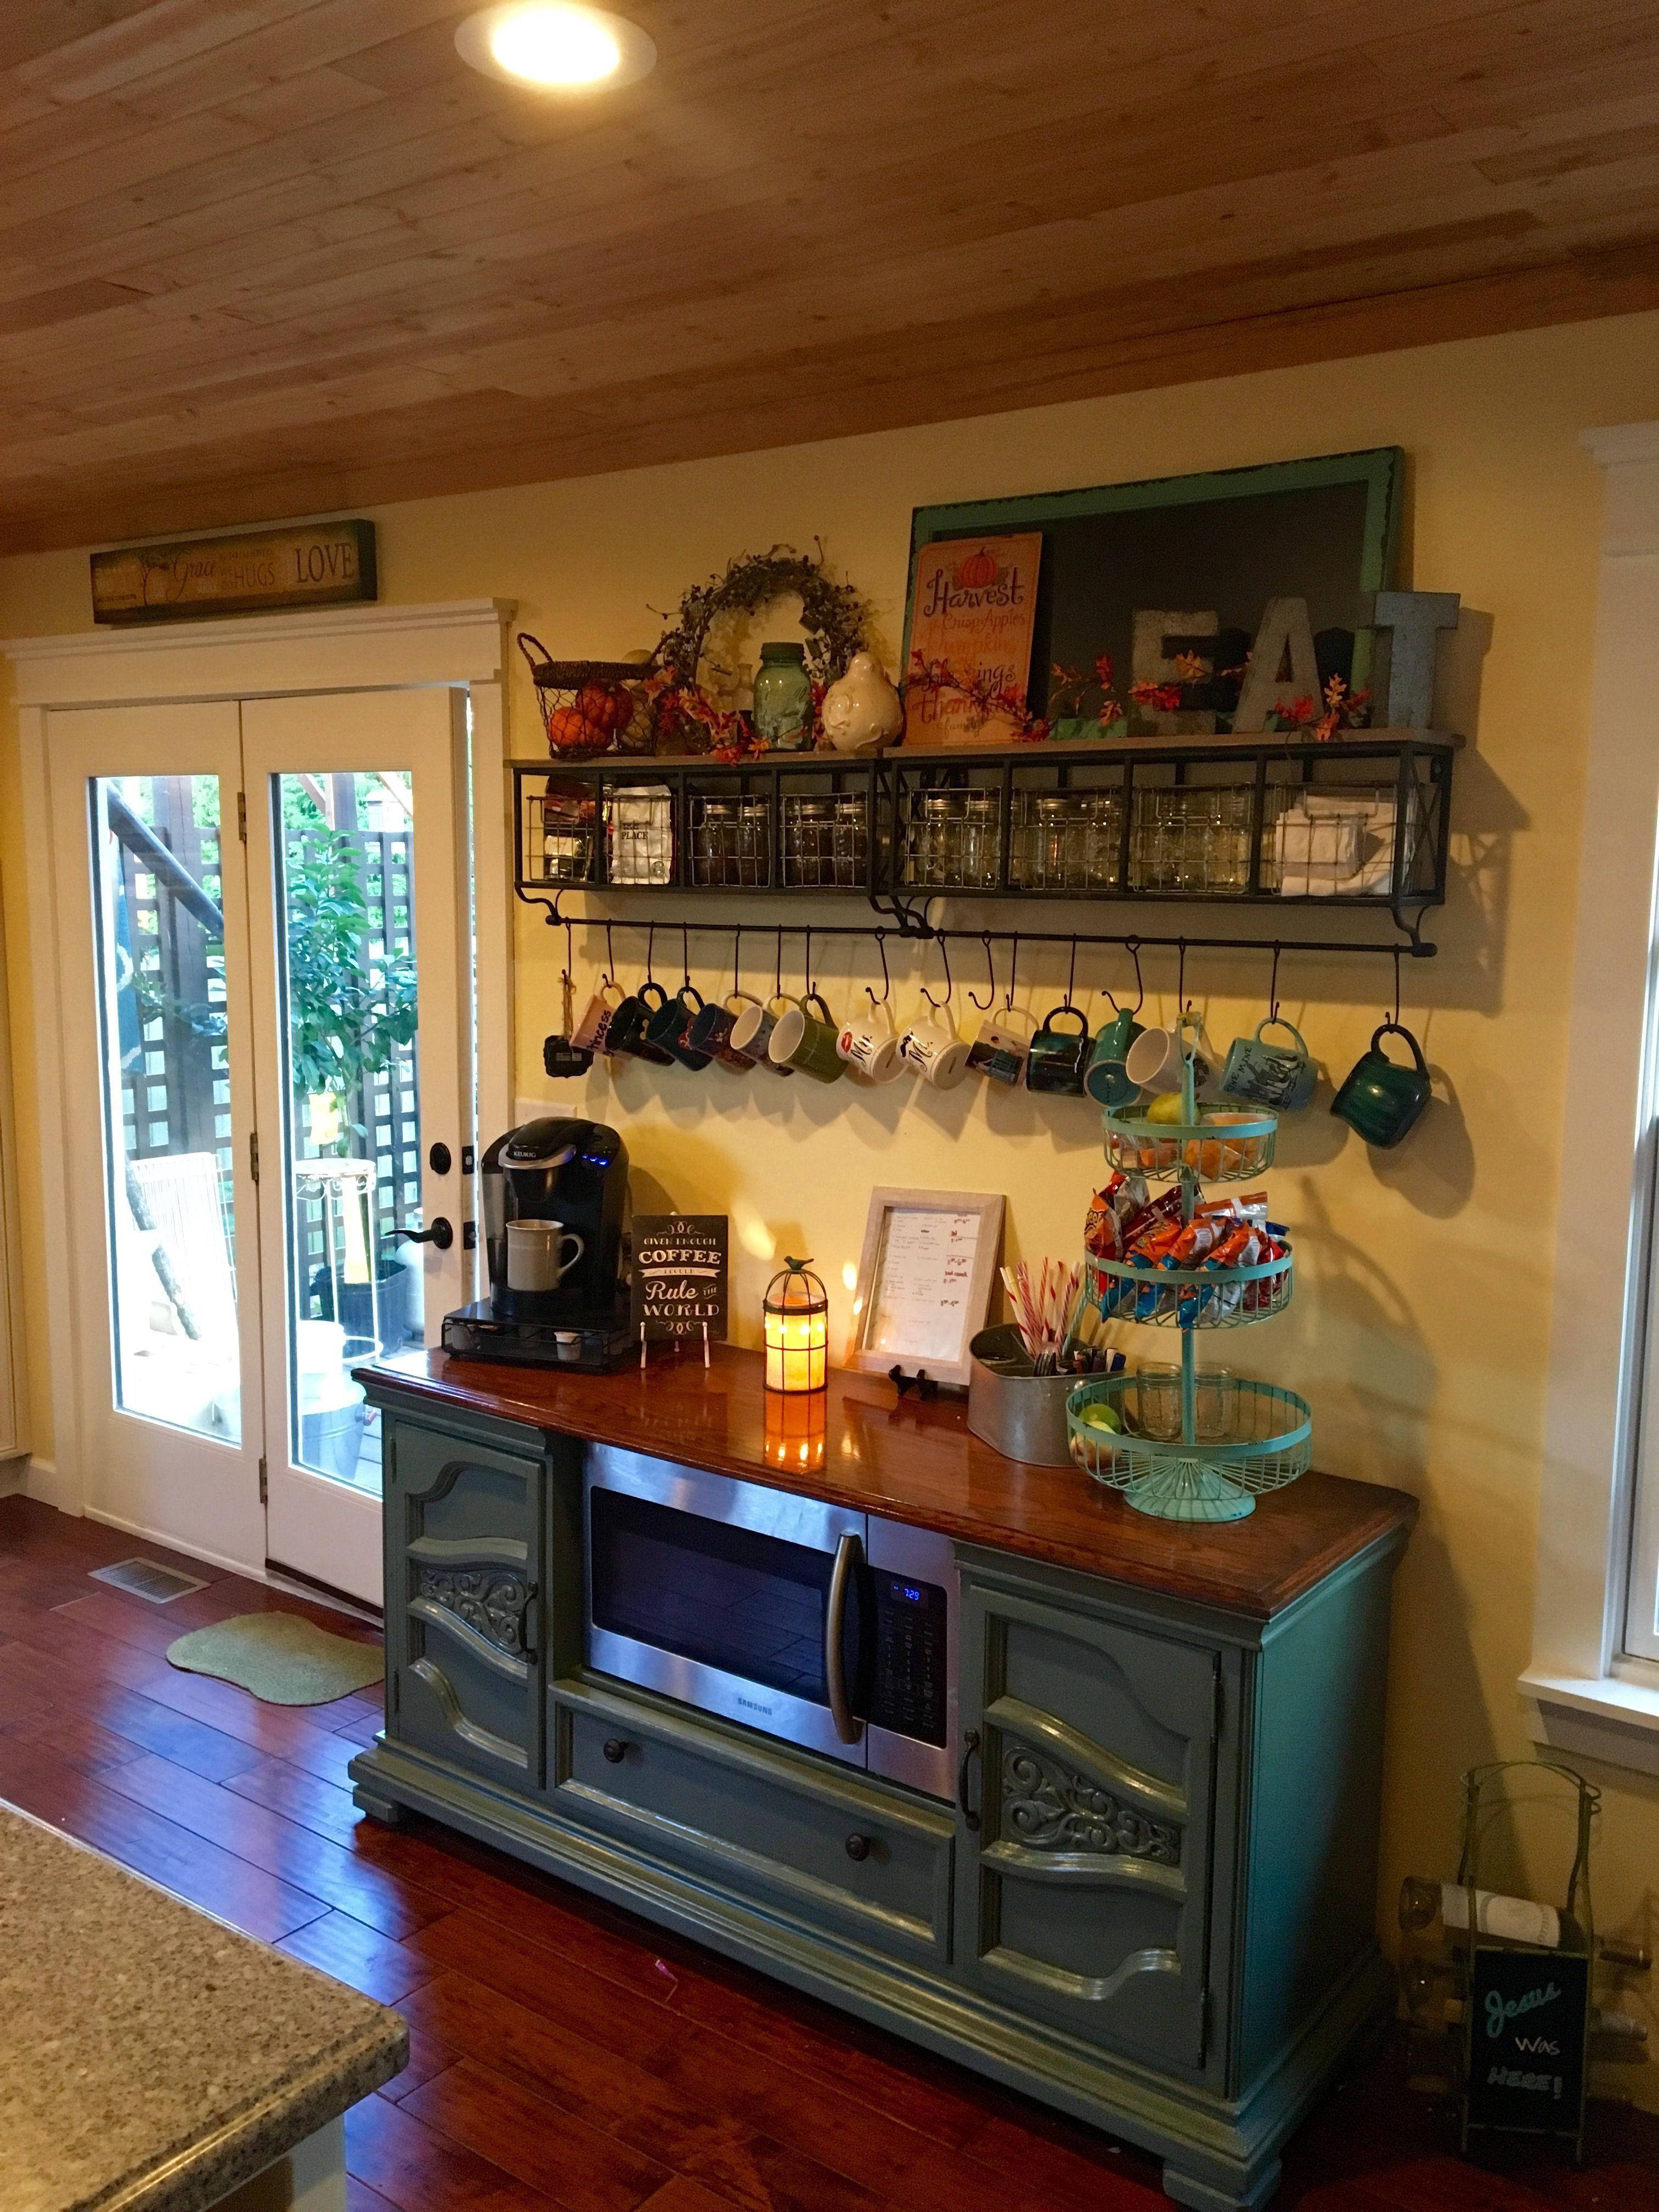 The coffee snack bar. Repurposed dresser turned microwave